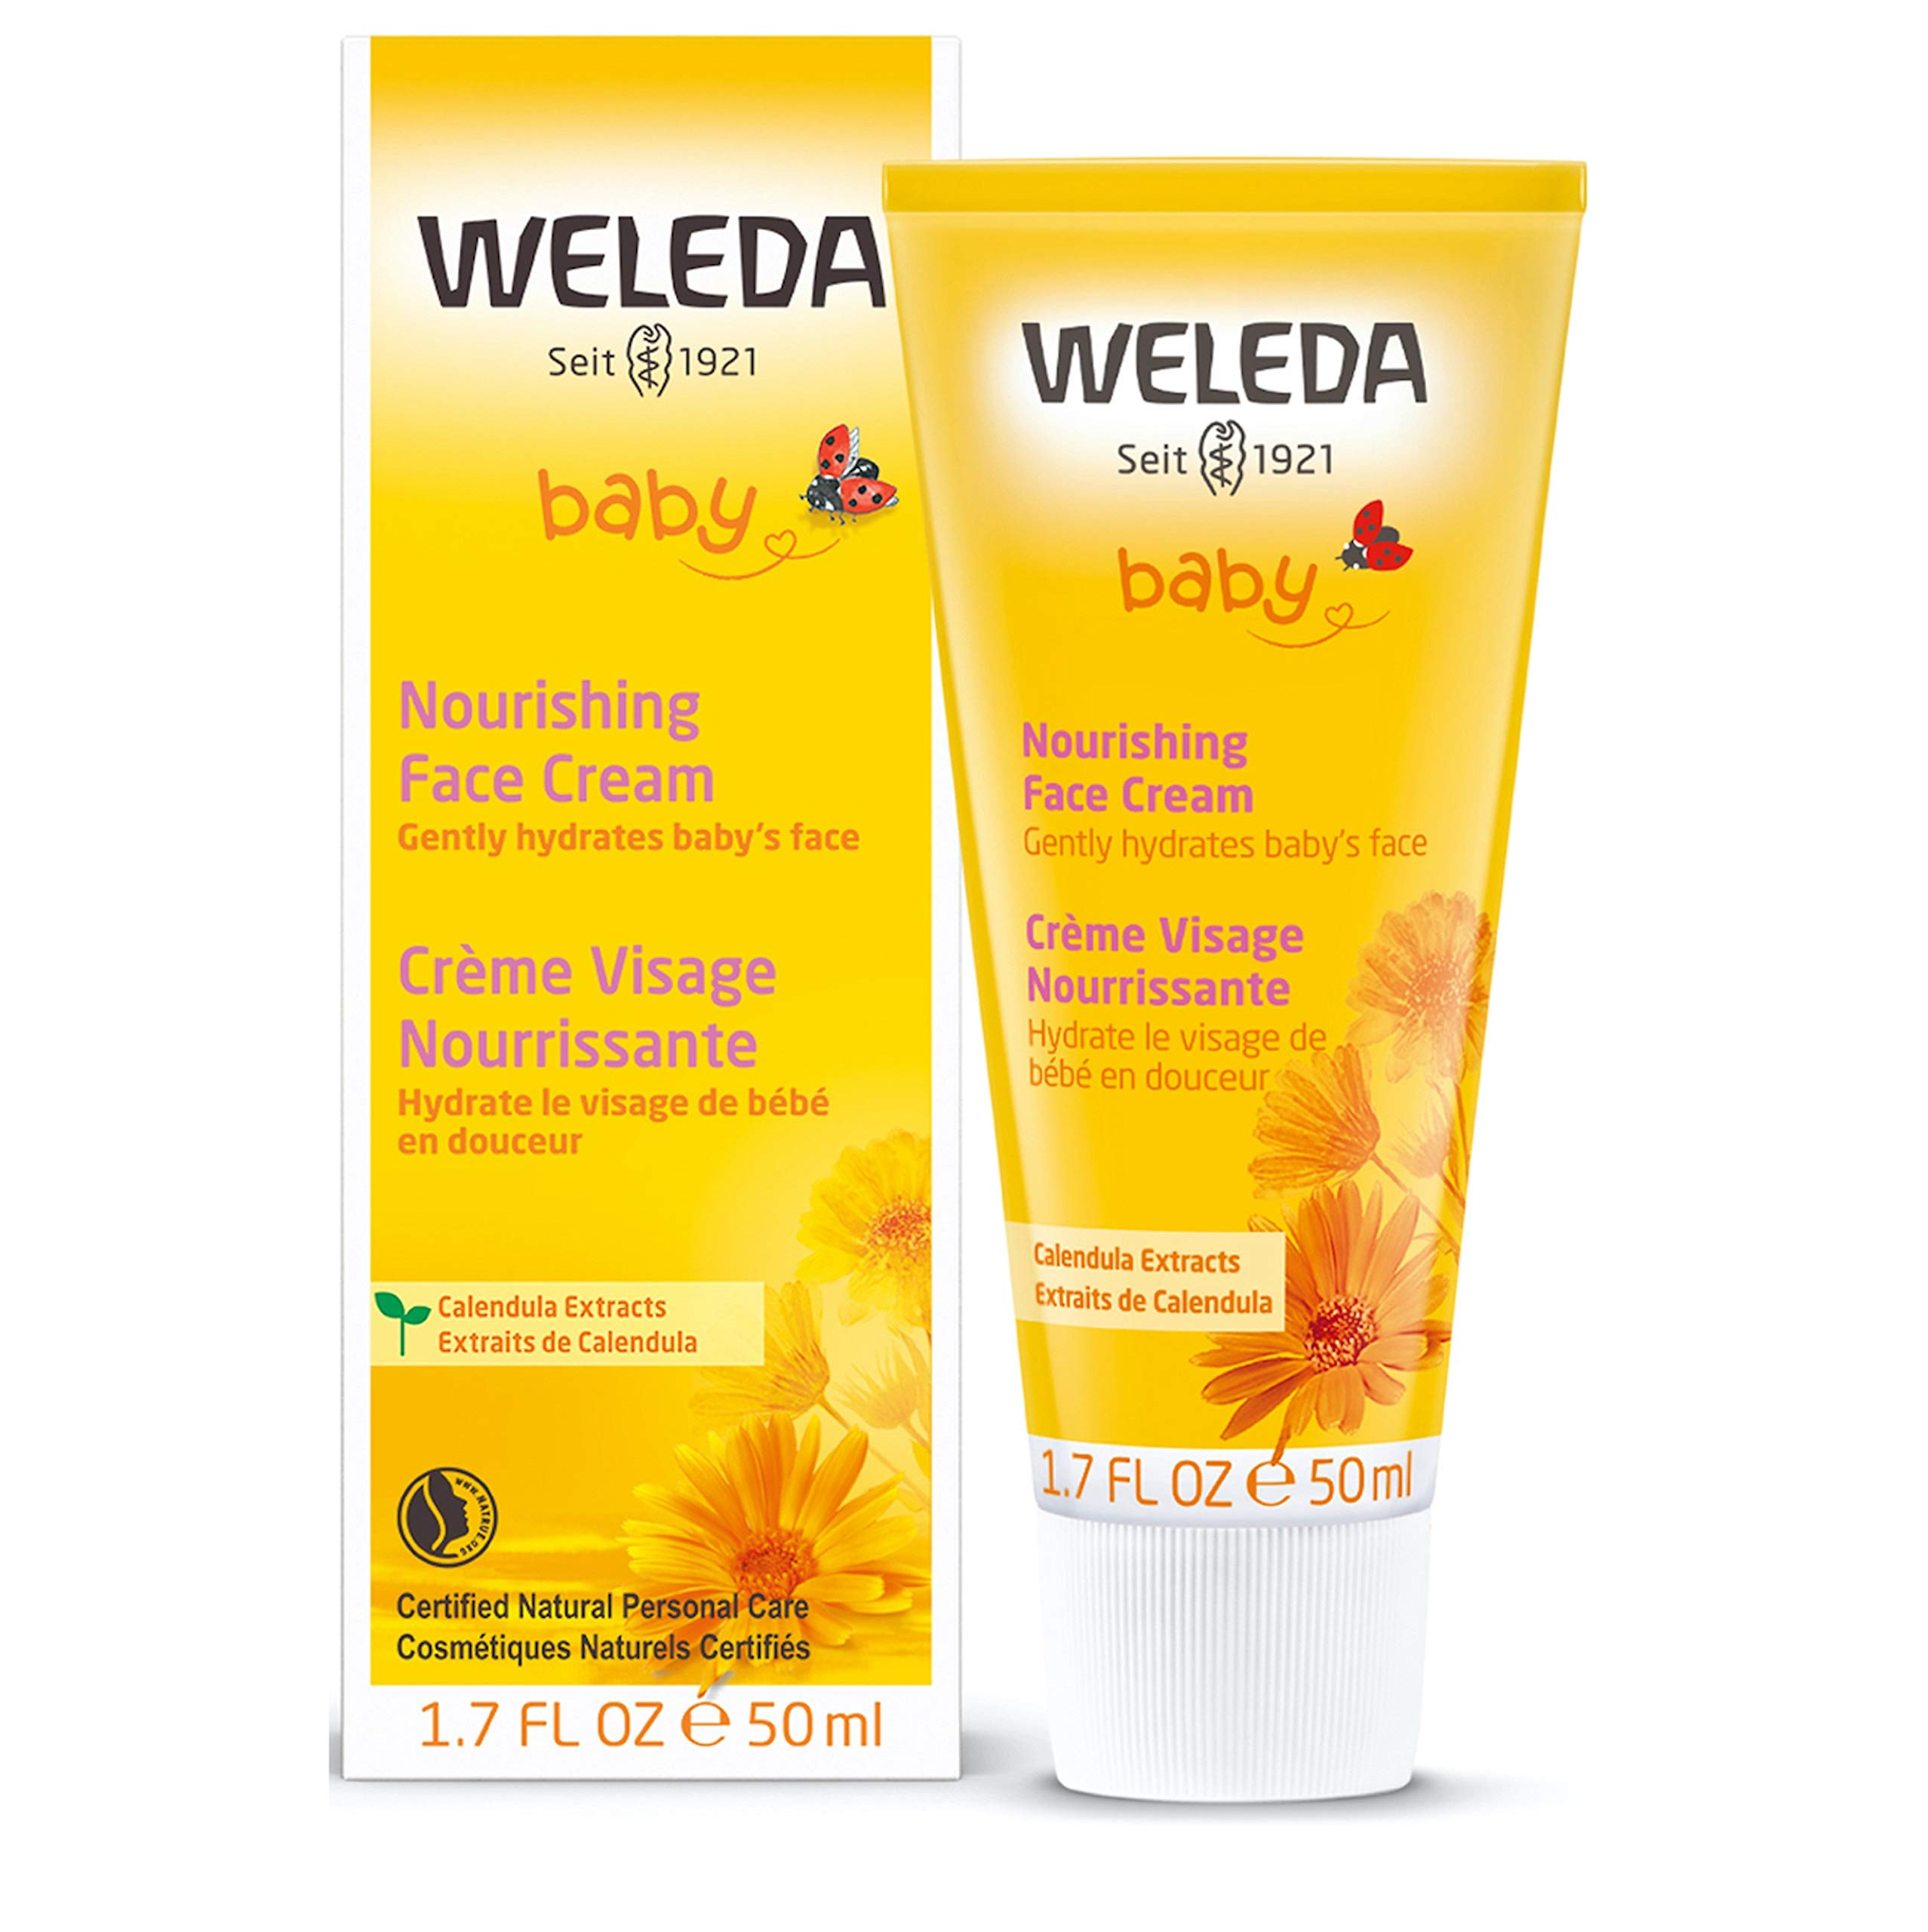 weleda skin food baby